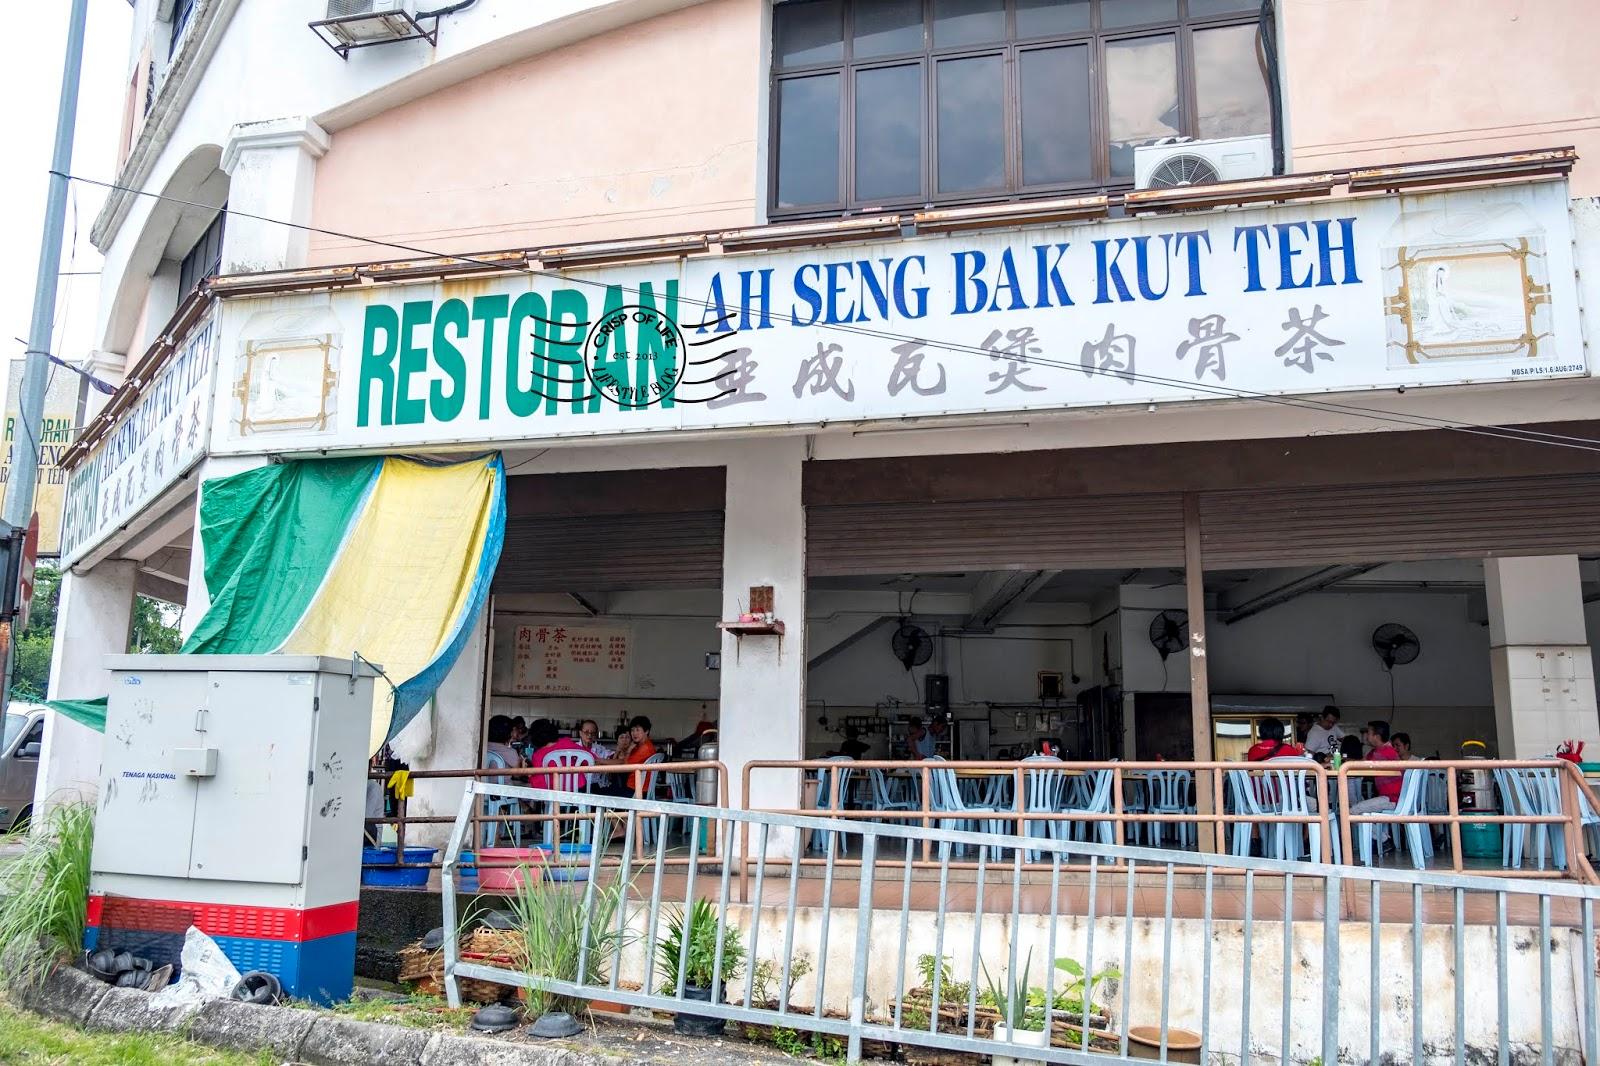 Ah Seng Bak Kut Teh 亚成瓦煲肉骨茶 at Shah Alam, Selangor